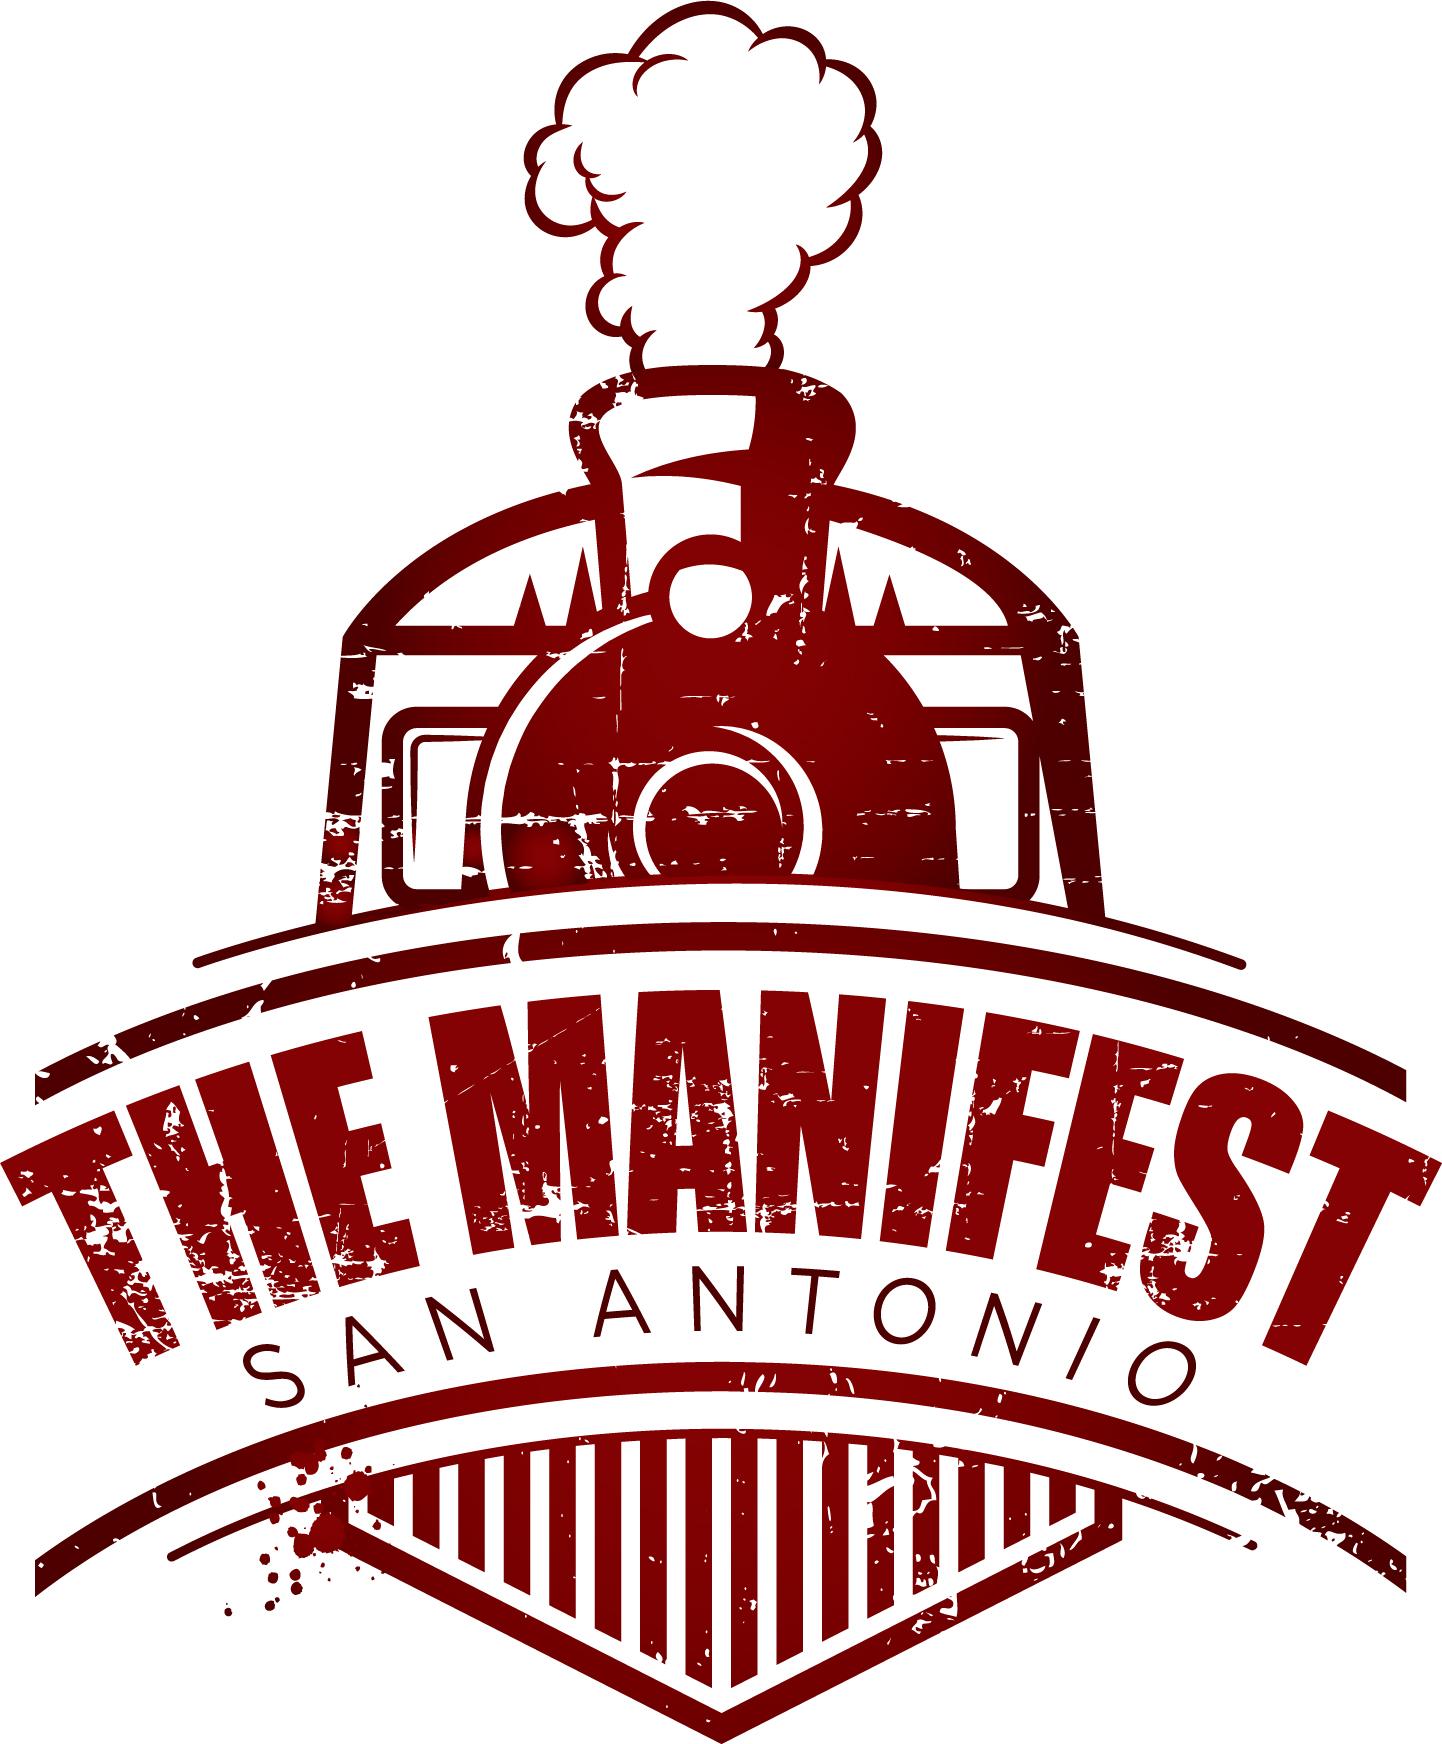 The Manifest San Antonio